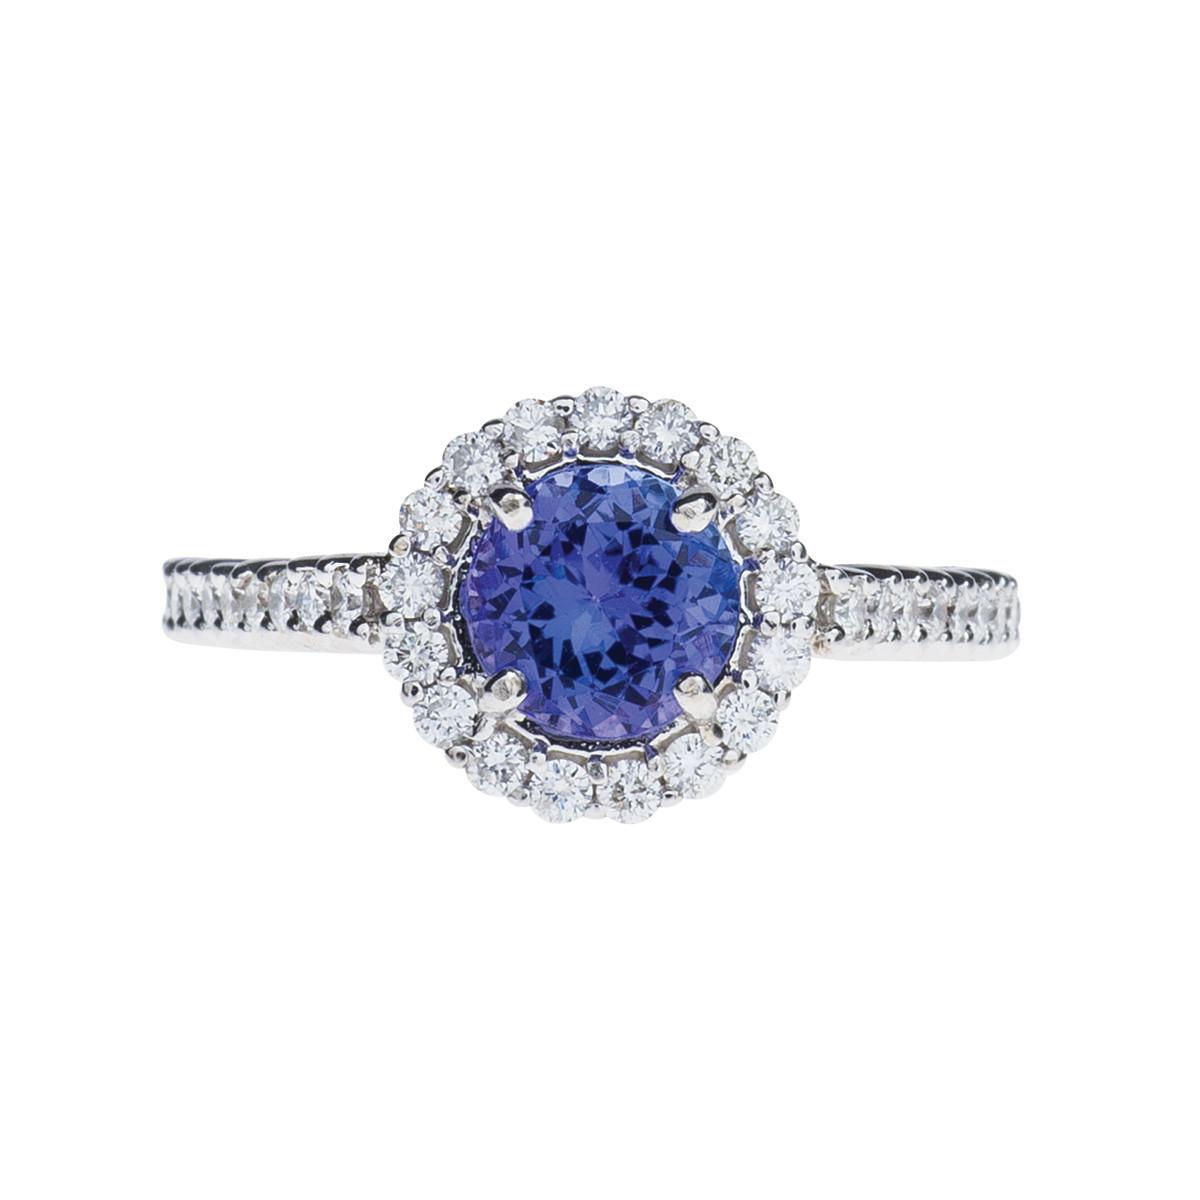 Vintage 1.70 CTW Tanzanite and Diamond Ring